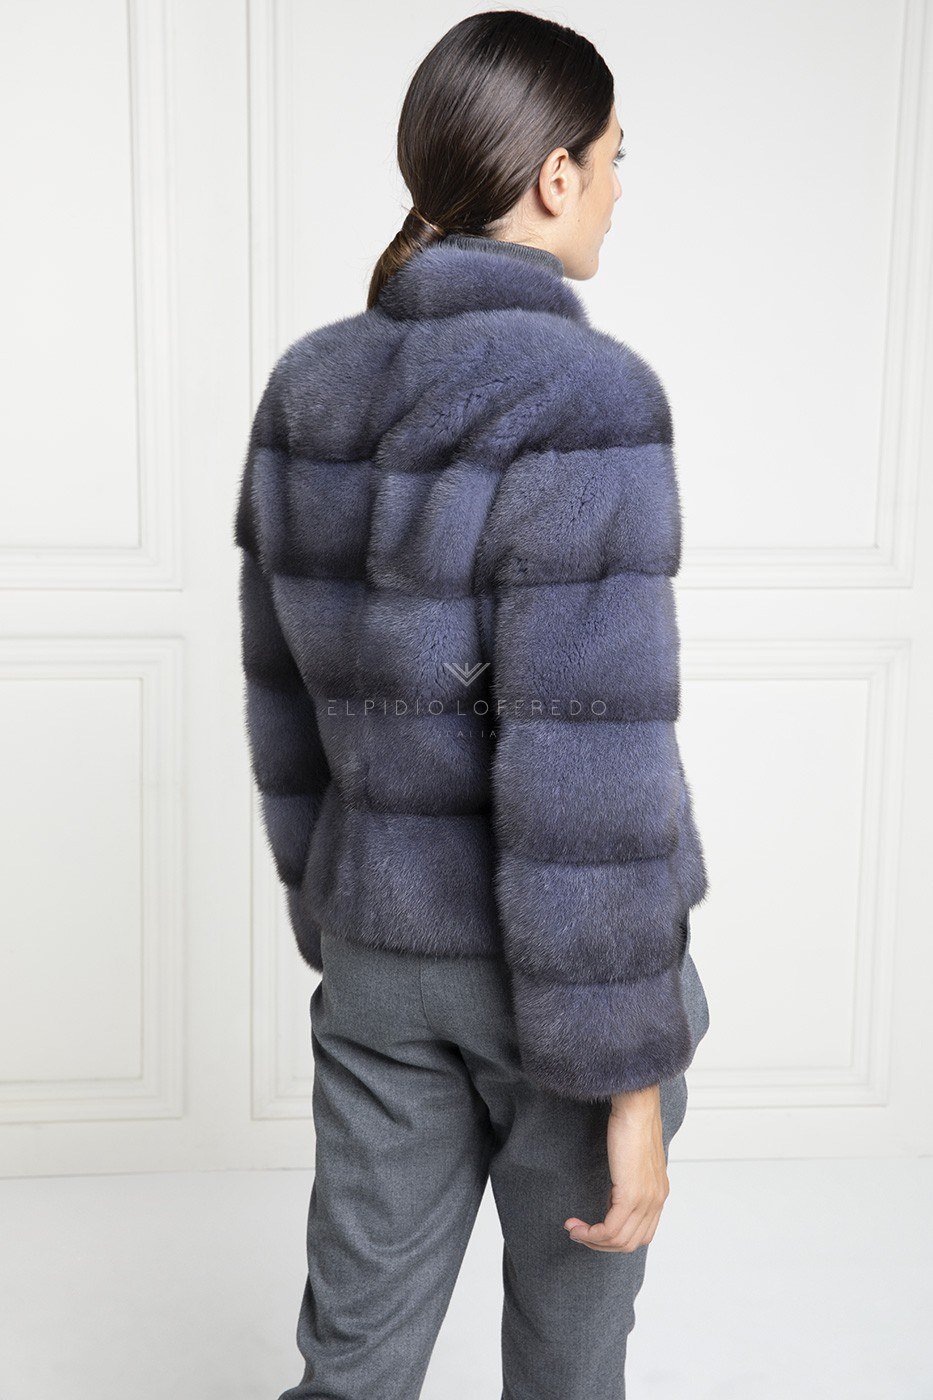 Giacca di Visone Blue Jeans con cerniera - Lunghezza 60 cm